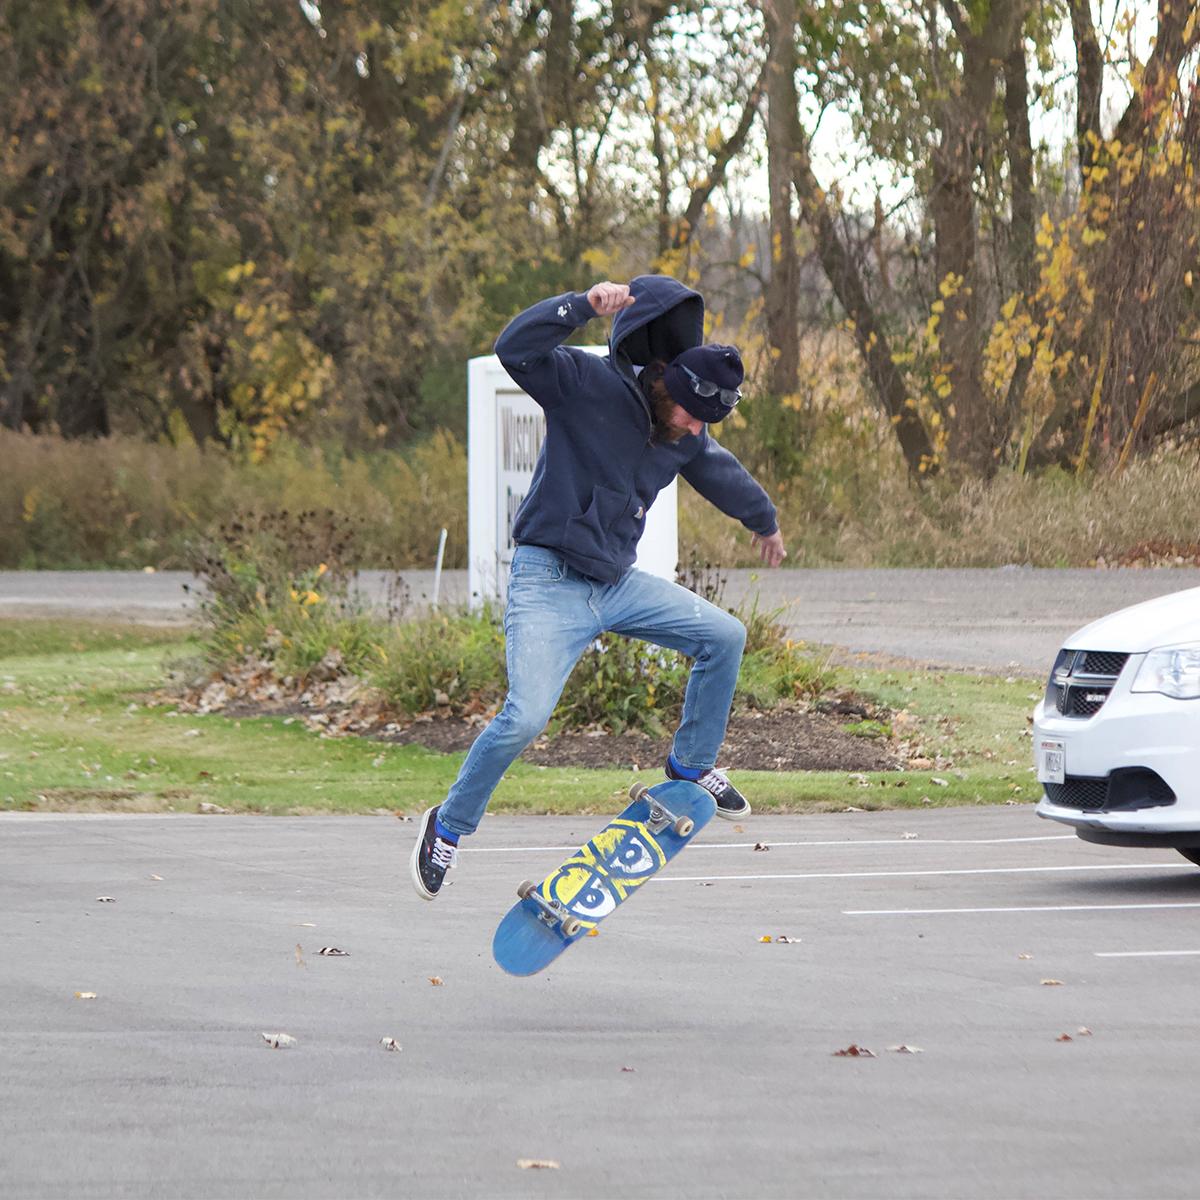 Raw Image of Skateboard Trick